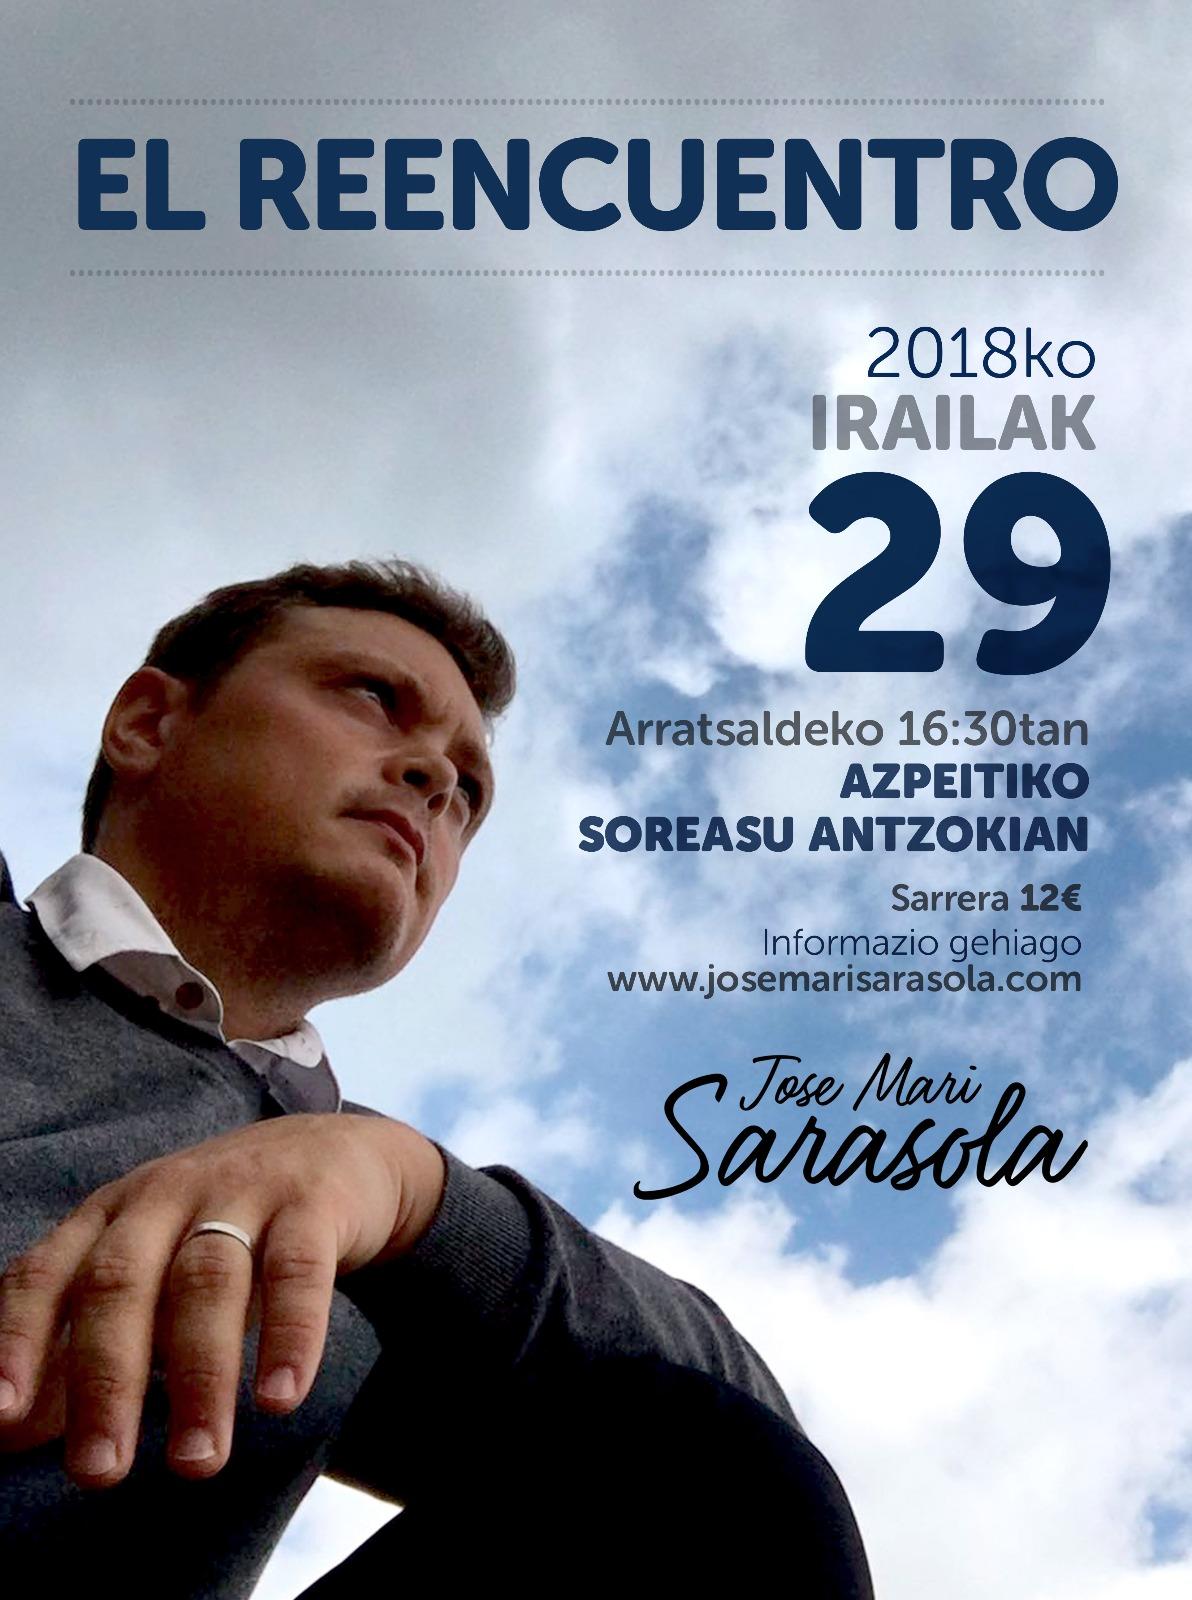 Jose Mari Sarasola: Elkar aurkitzea (El reencuentro)